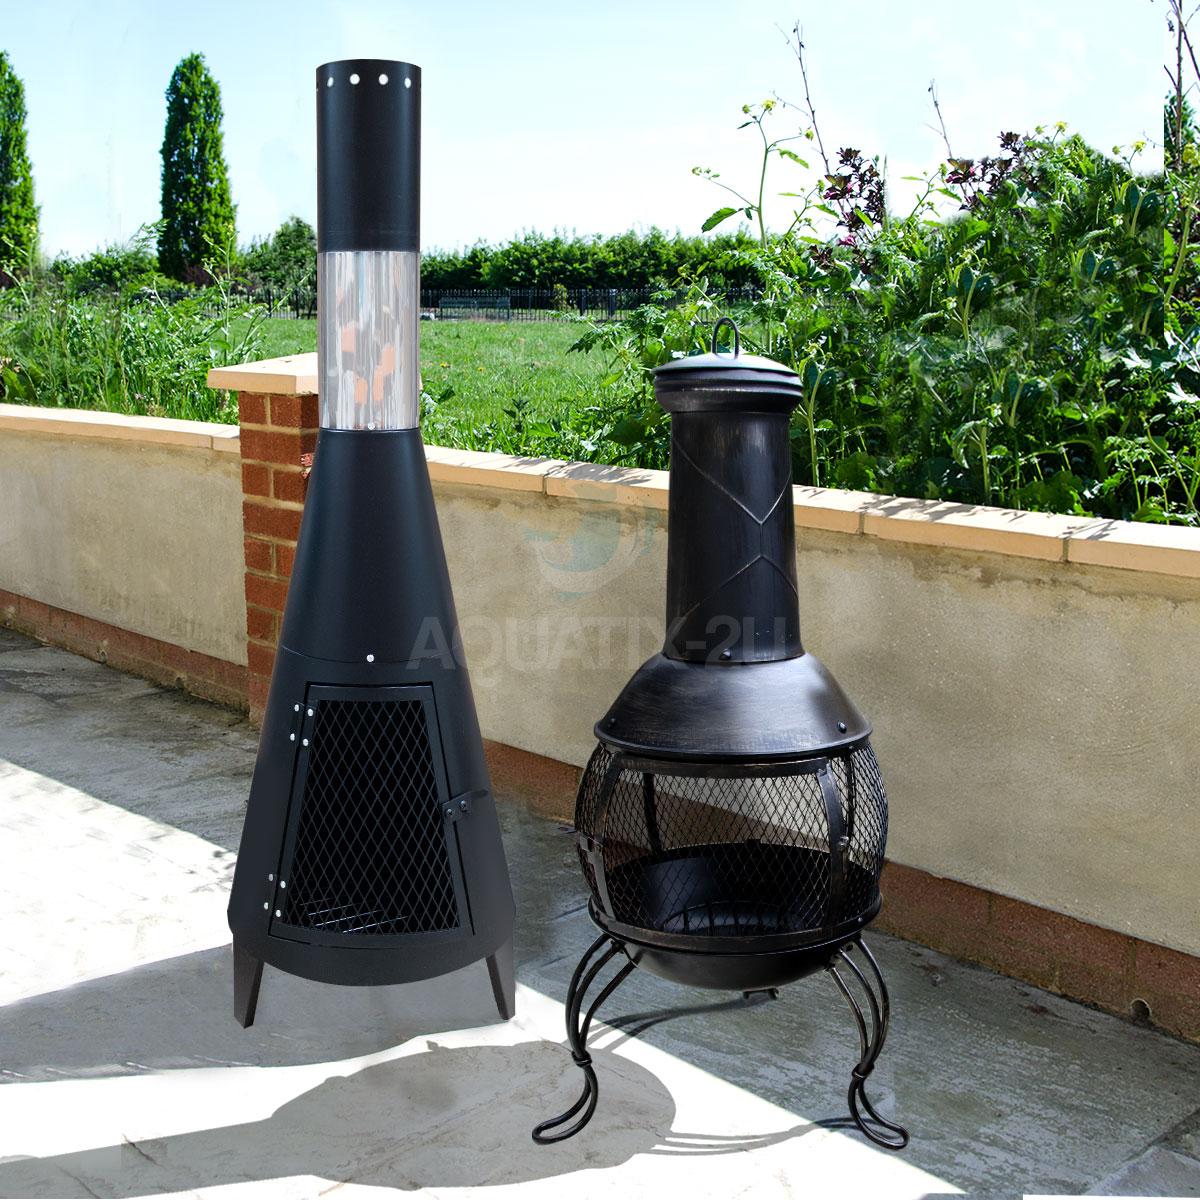 Outdoor Chiminea Garden Patio Log Burner Wood Fire Heater